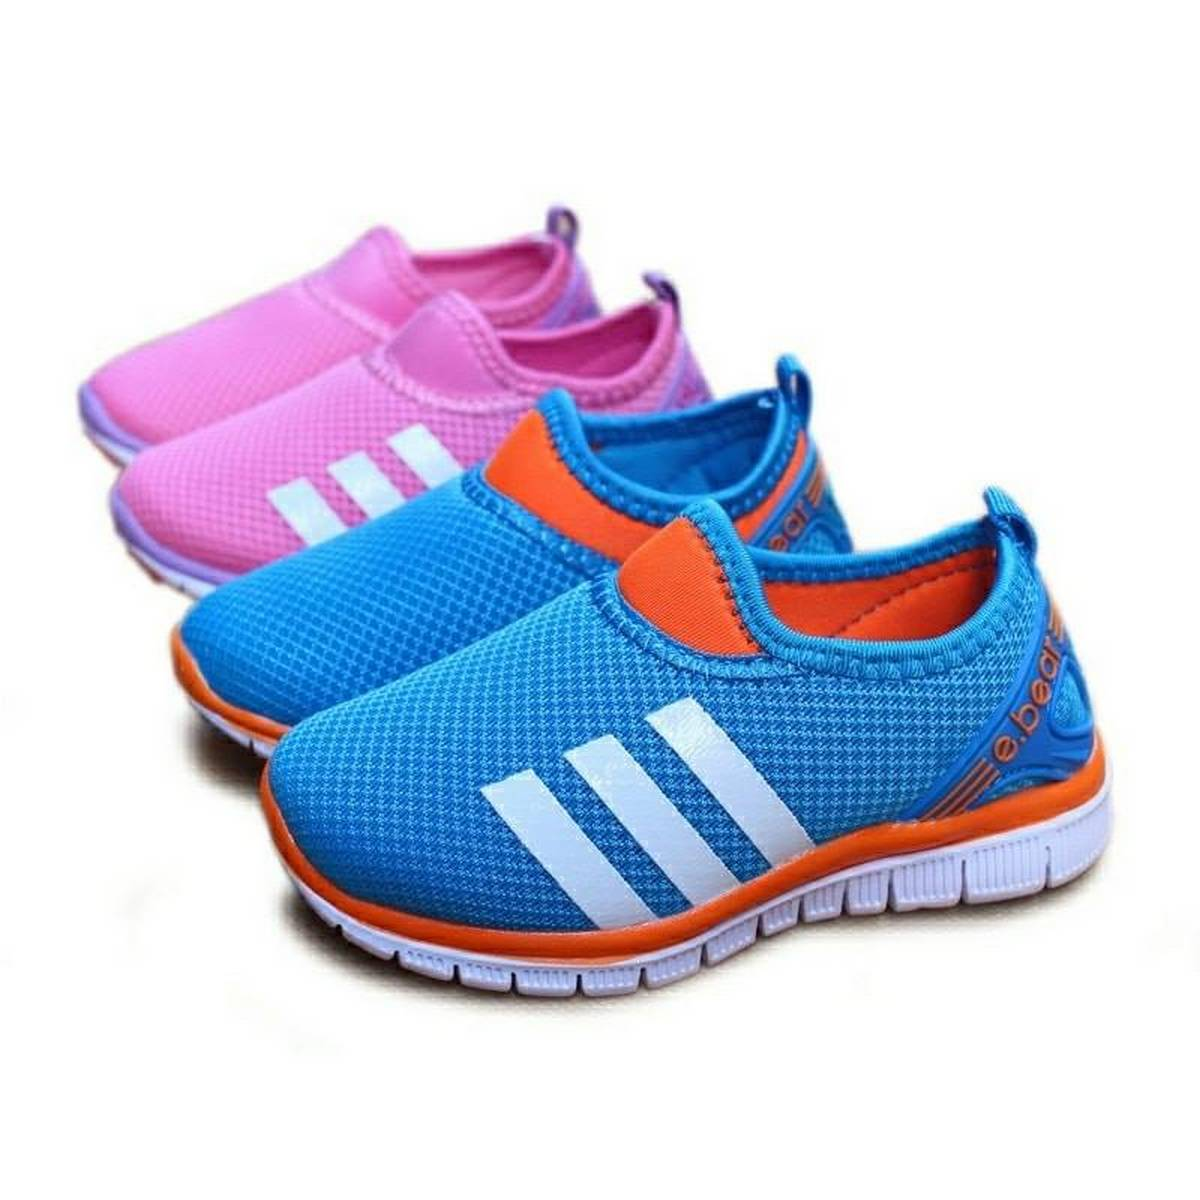 Kids fashion shoes